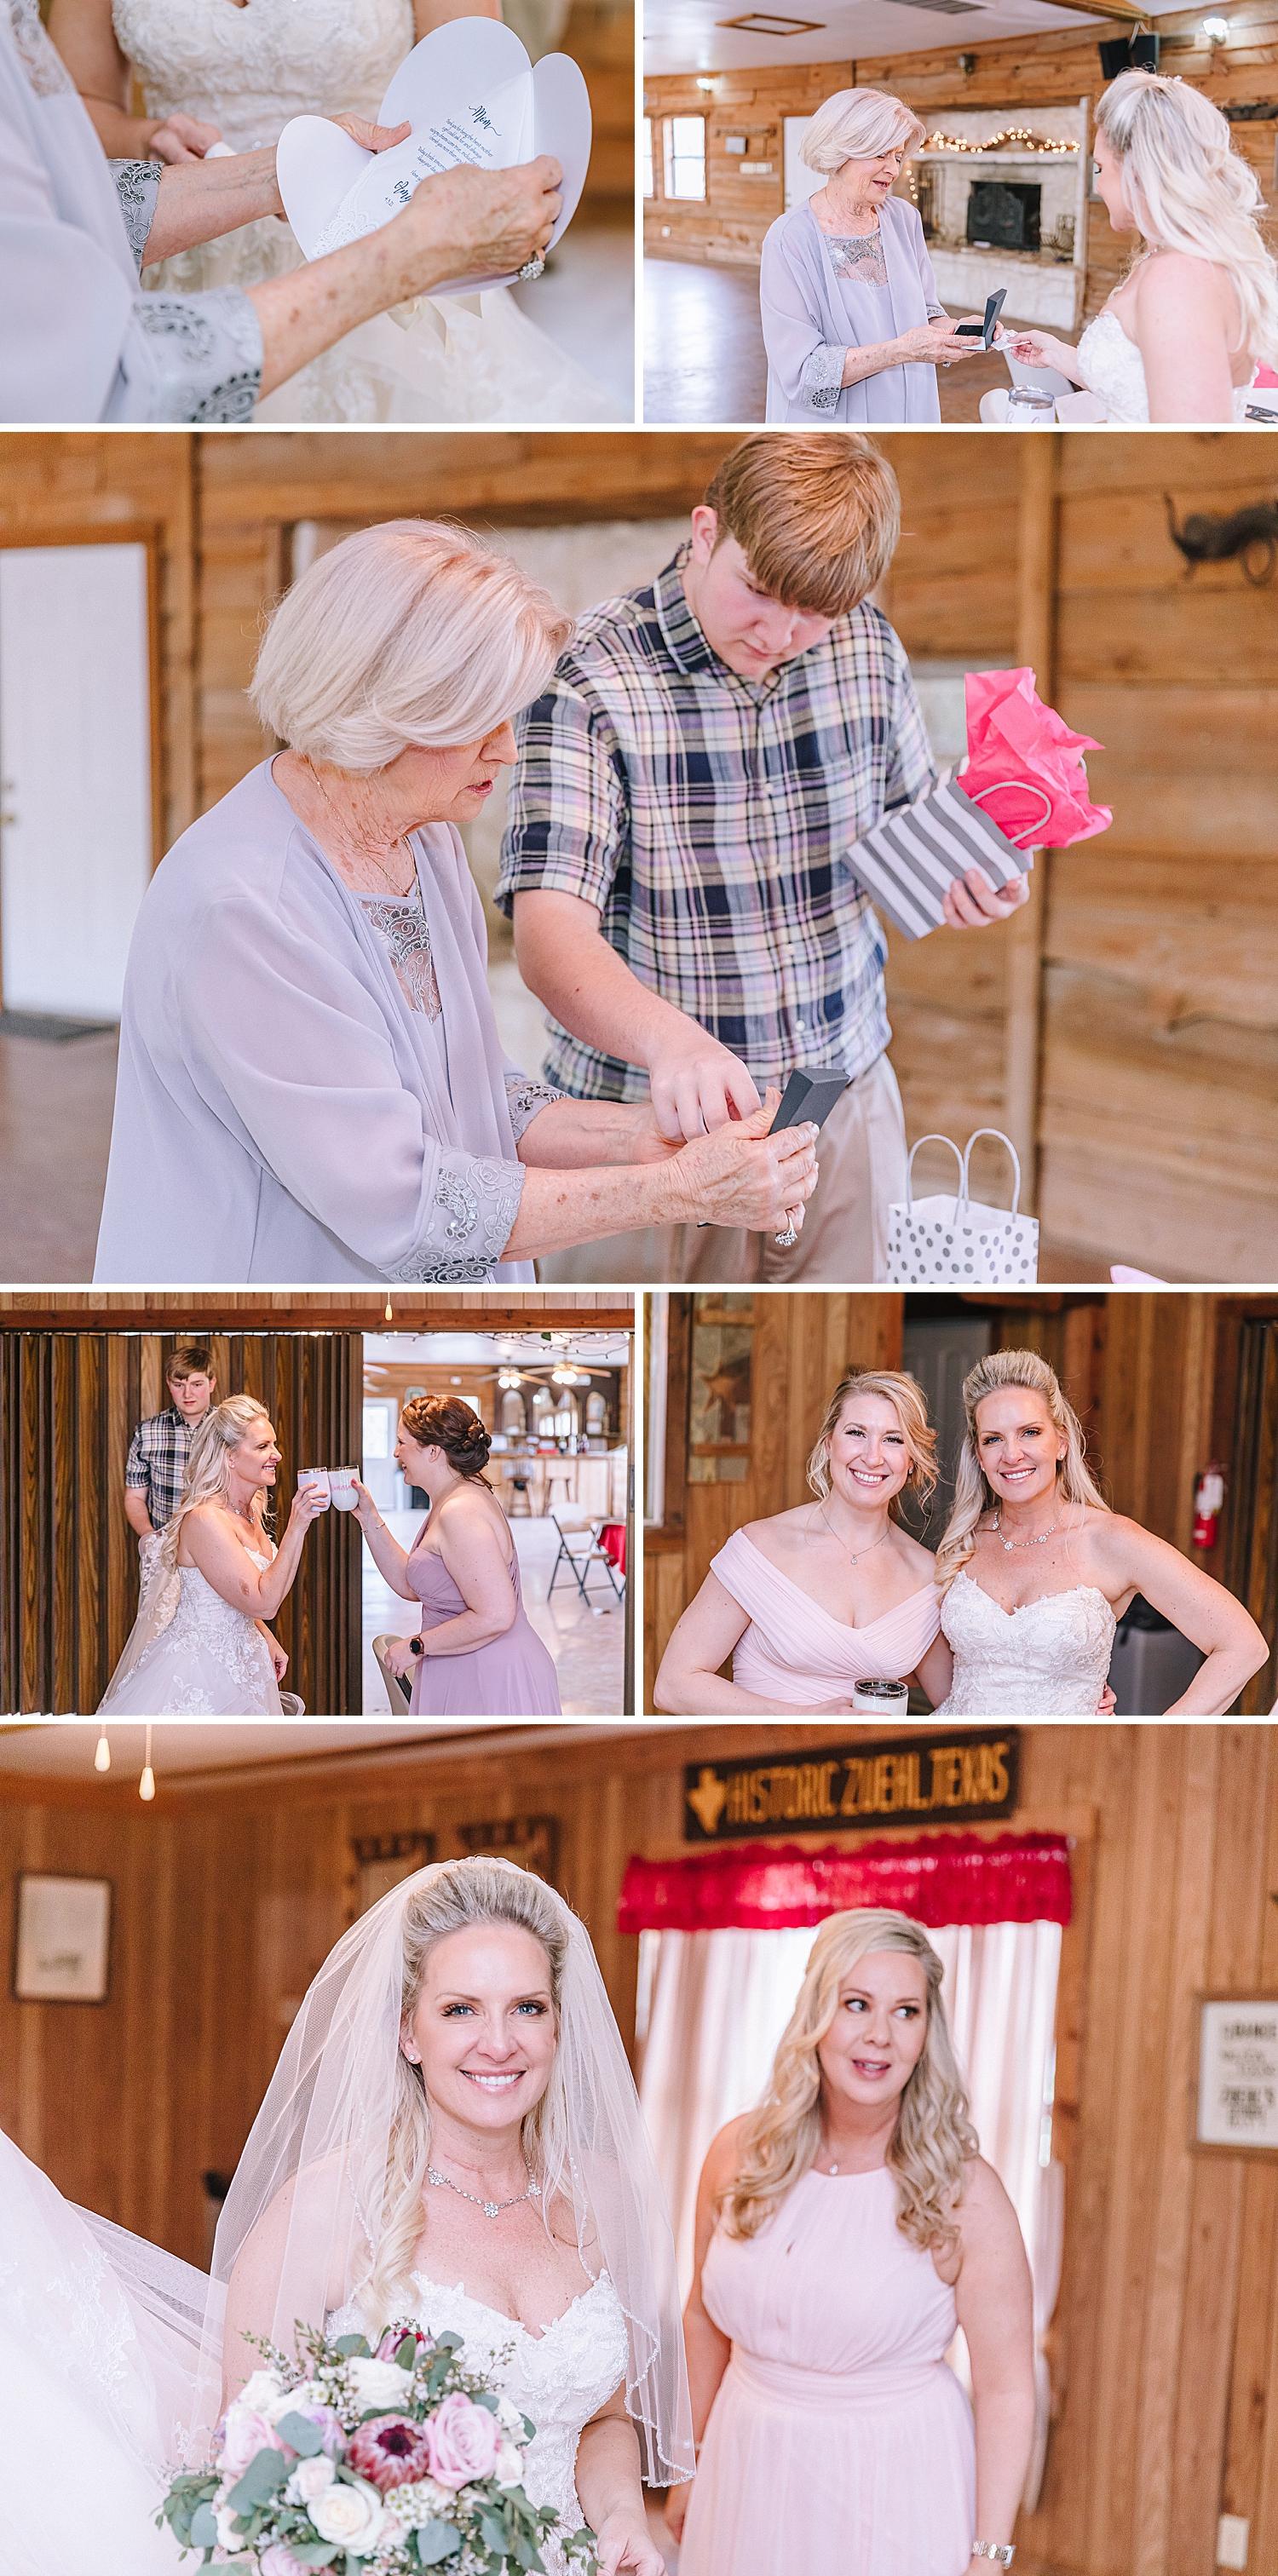 Rio-Cibilo-Ranch-Marion-Texas-Wedding-Rustic-Blush-Rose-Quartz-Details-Carly-Barton-Photography_0023.jpg